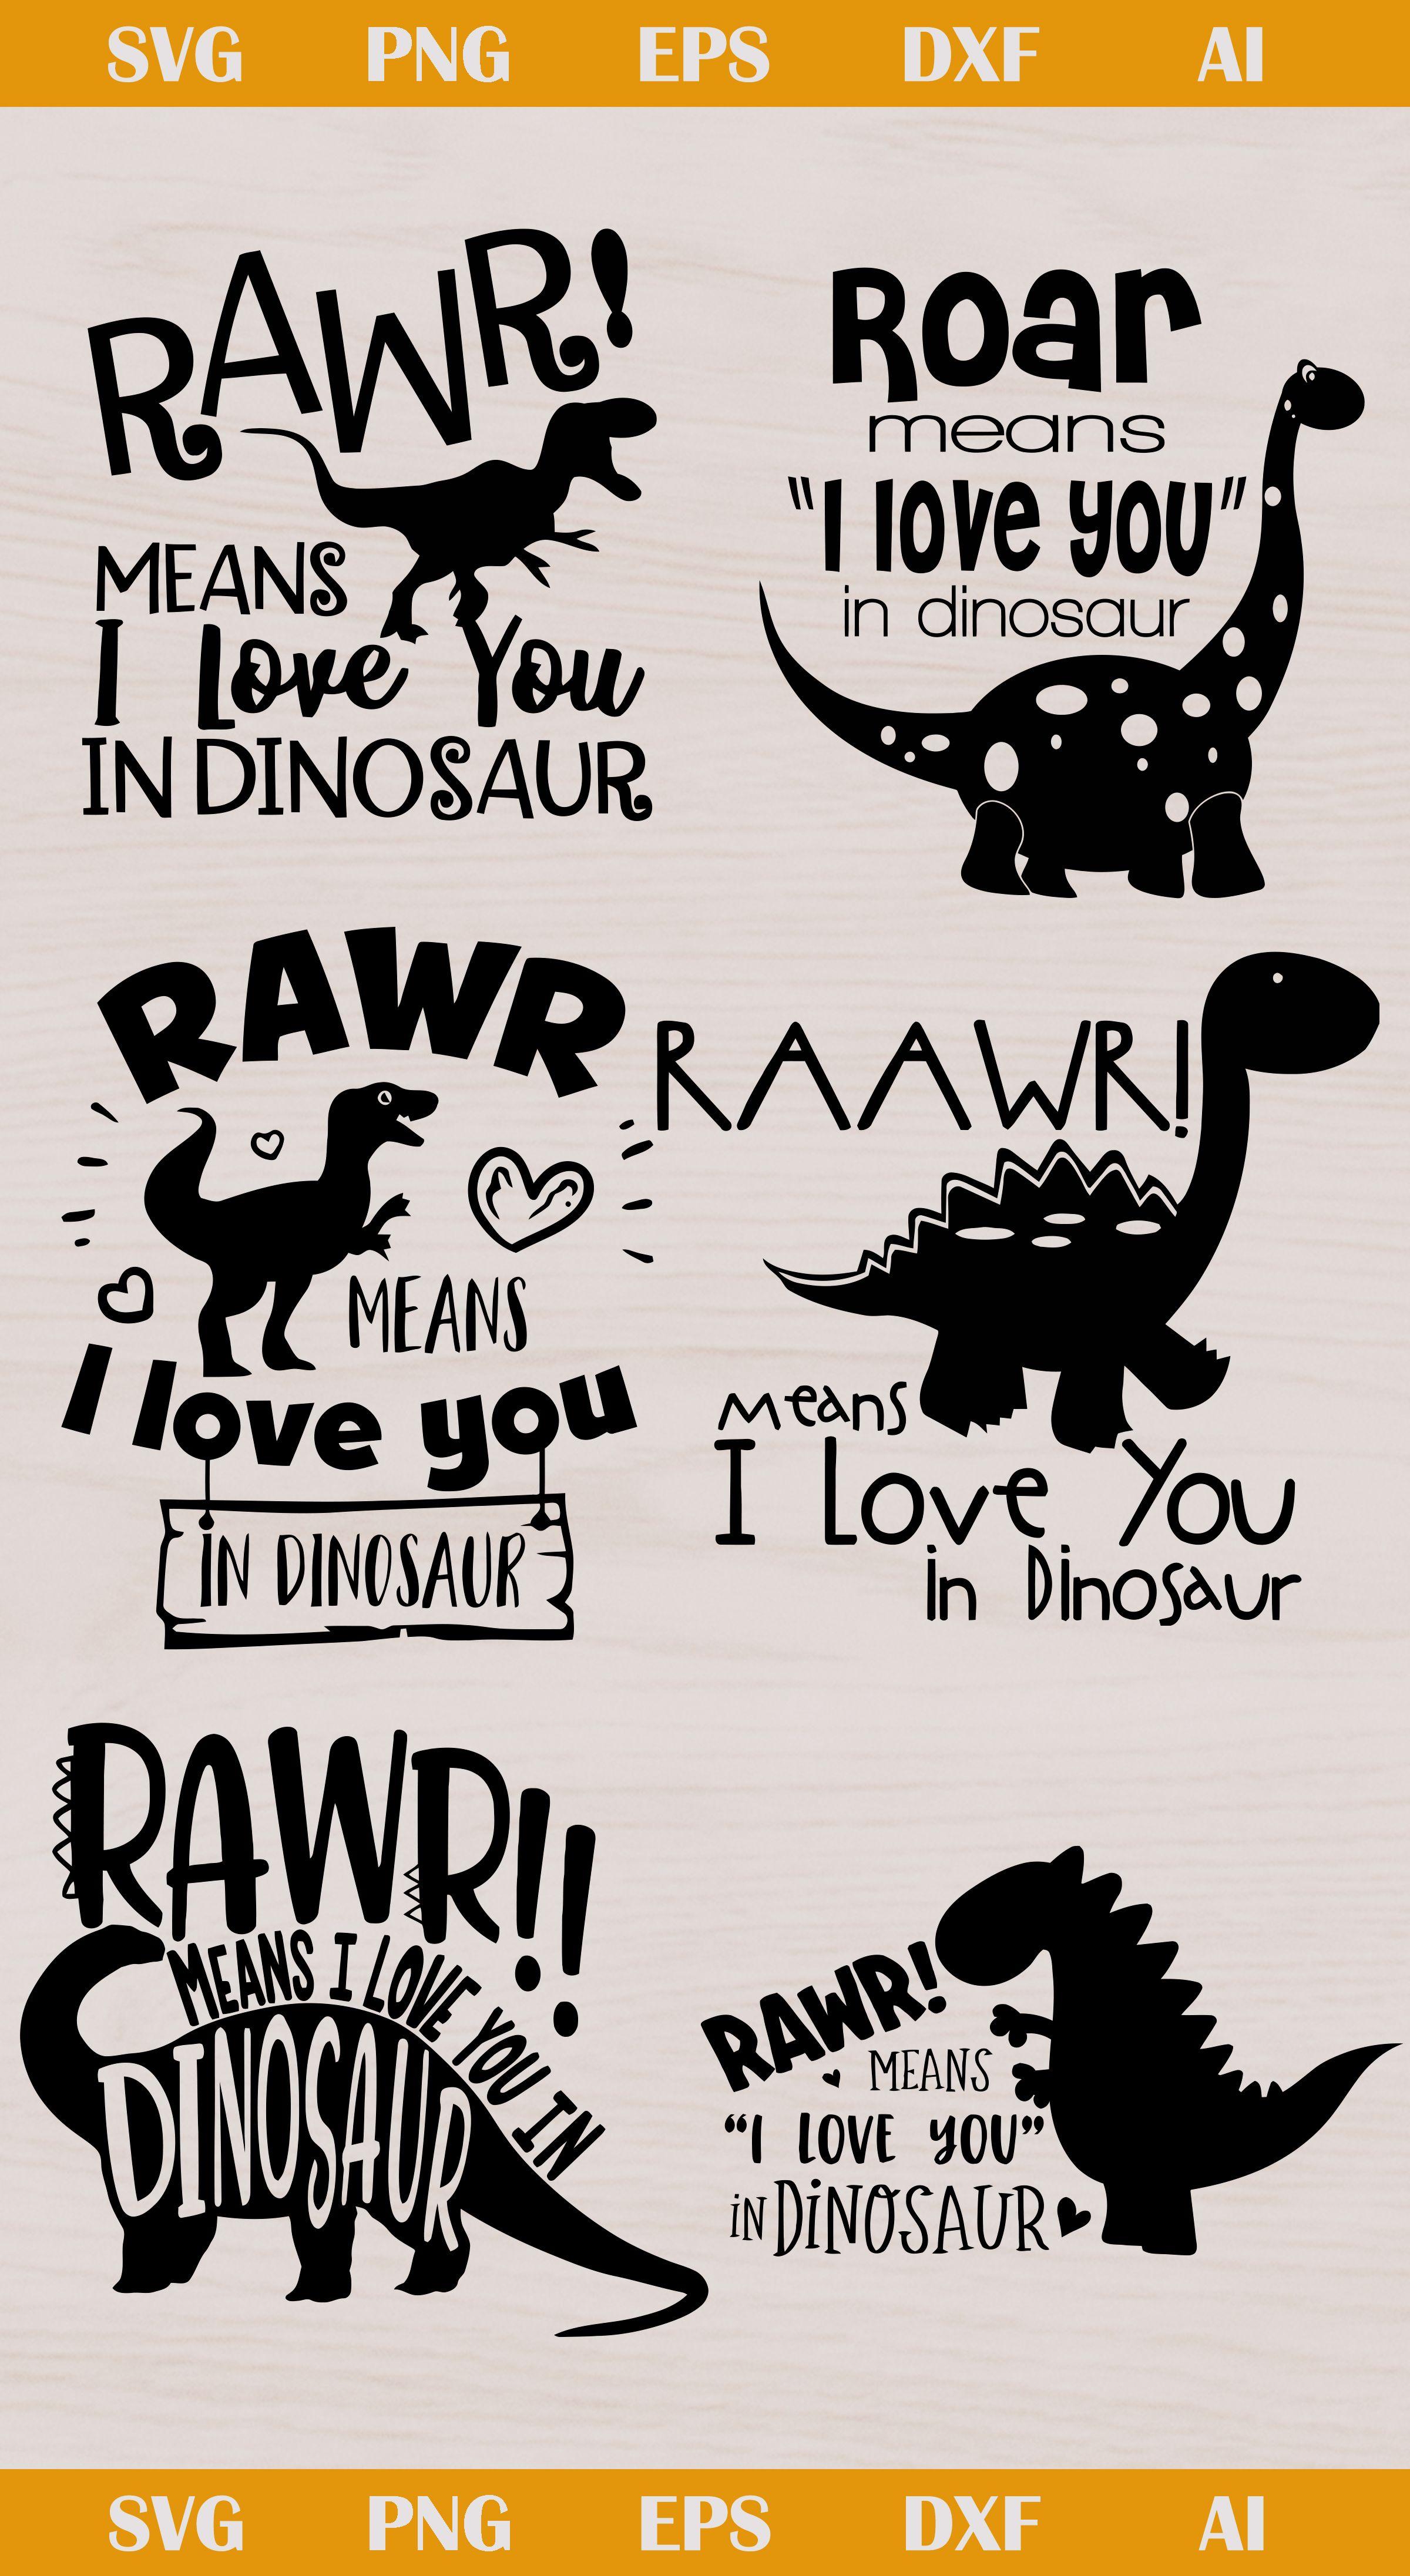 Rawr Dinosaur svg, Rawr Dinosaur silhouette, Rawr Dinosaur